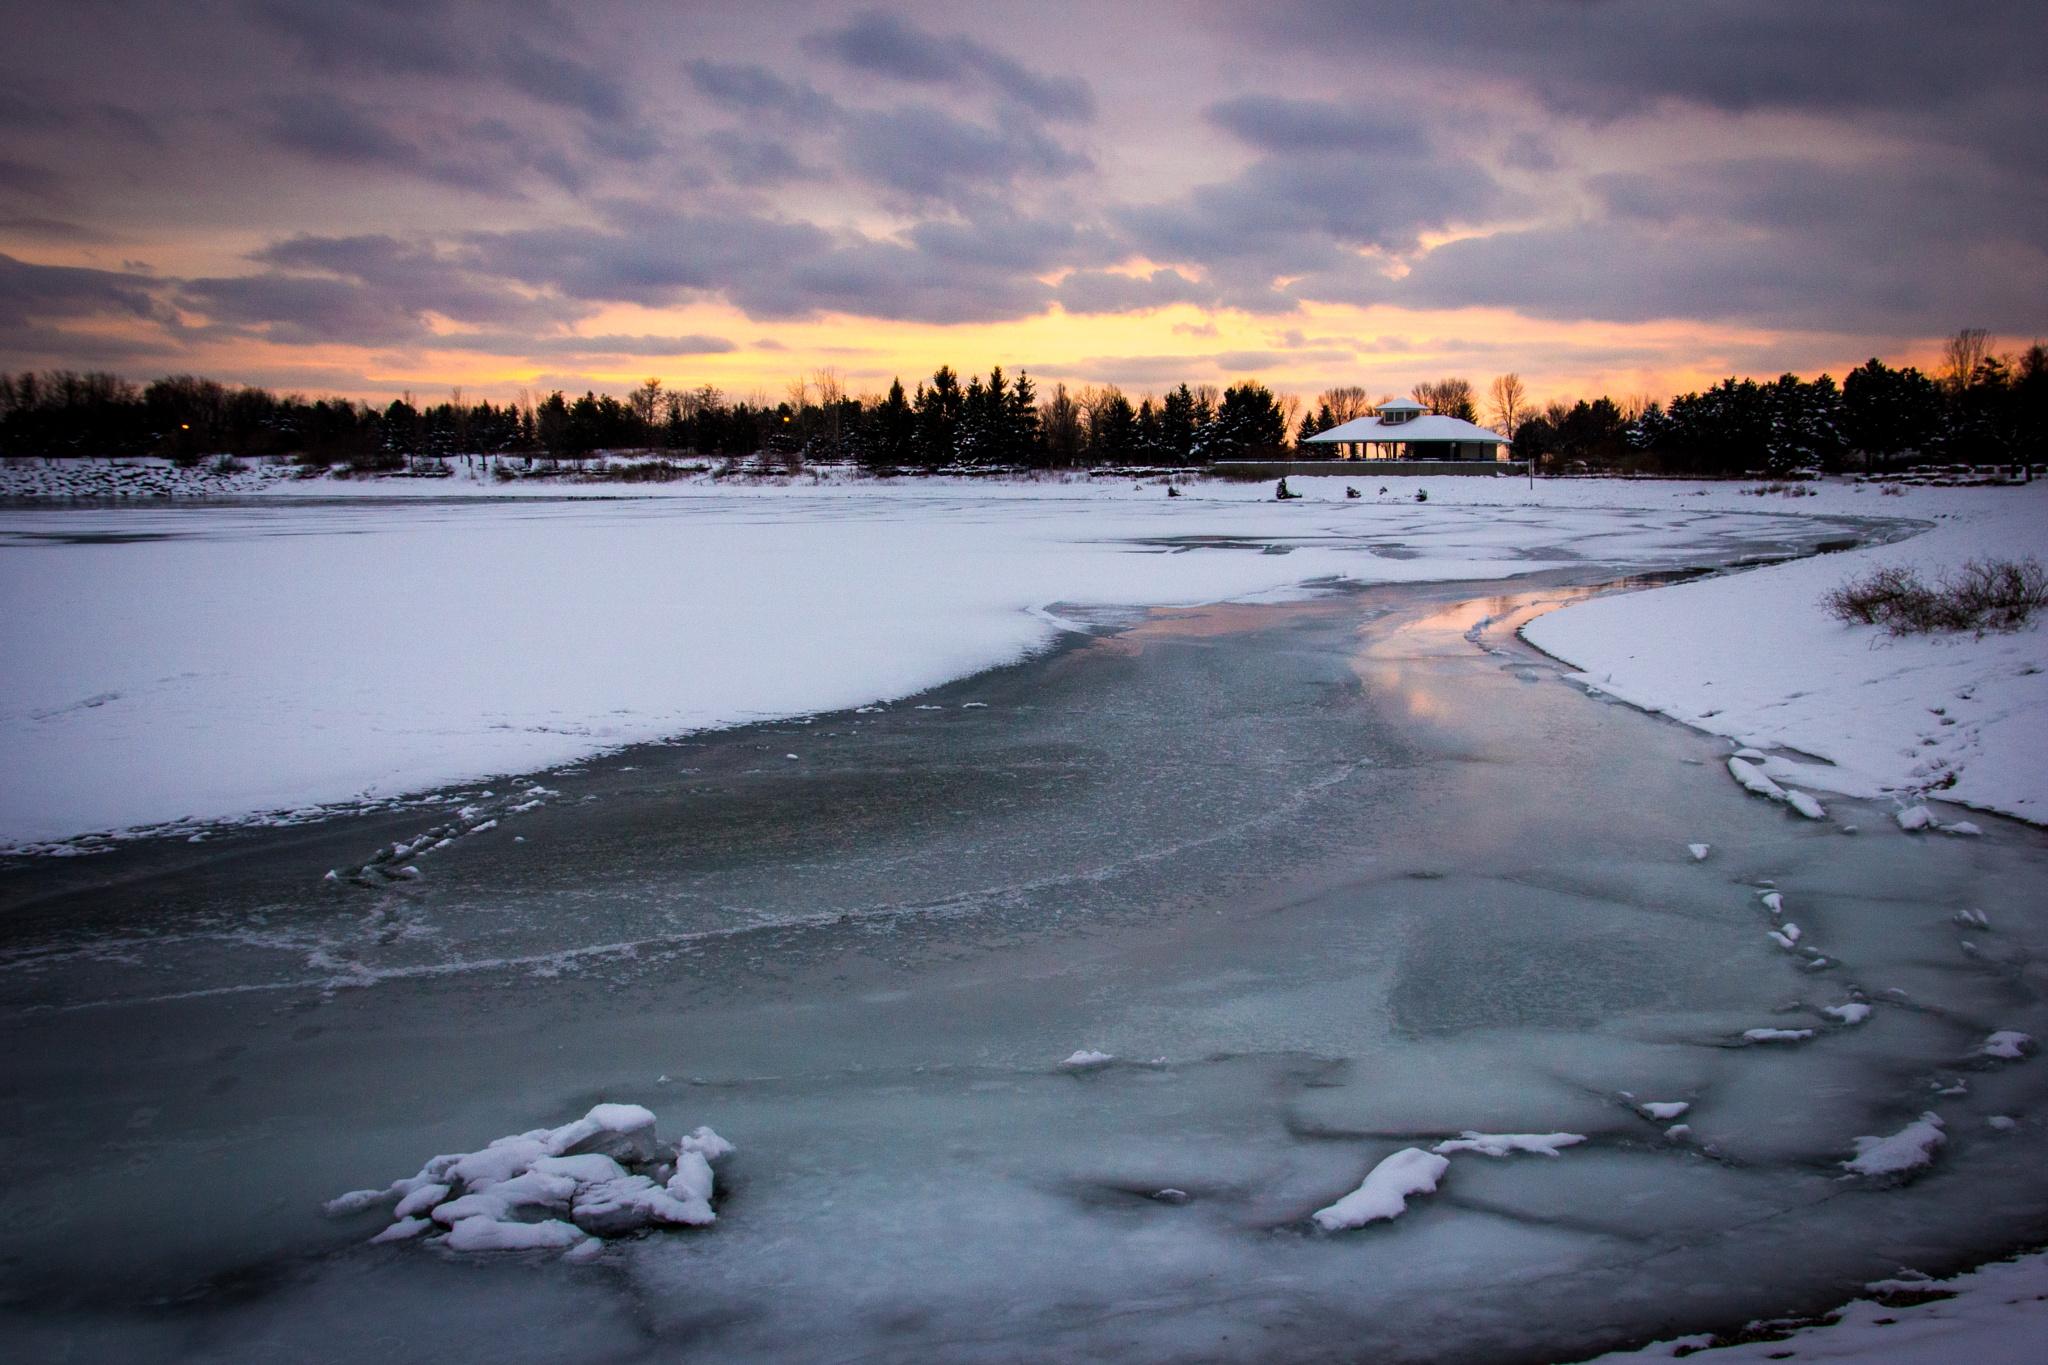 Winter Eve by denisemacdonald